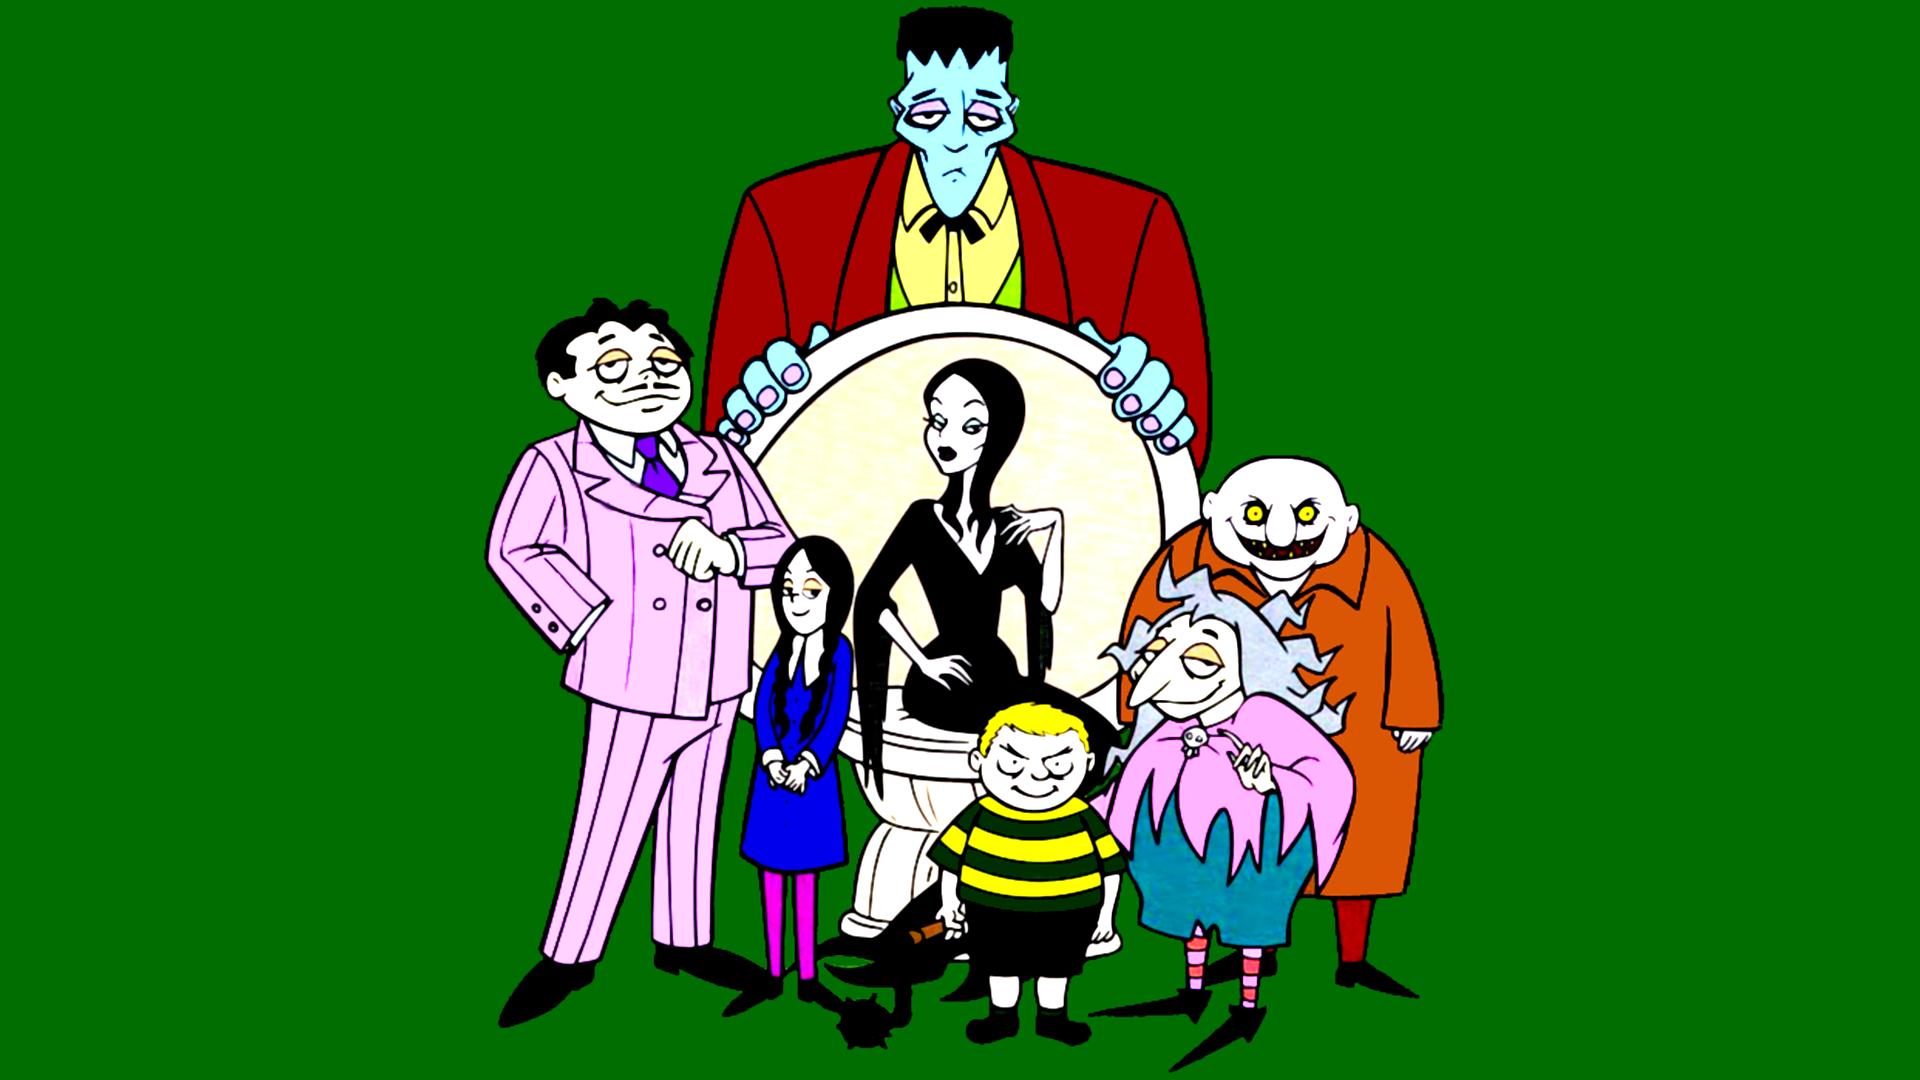 The Addams Family - 90s Cartoons